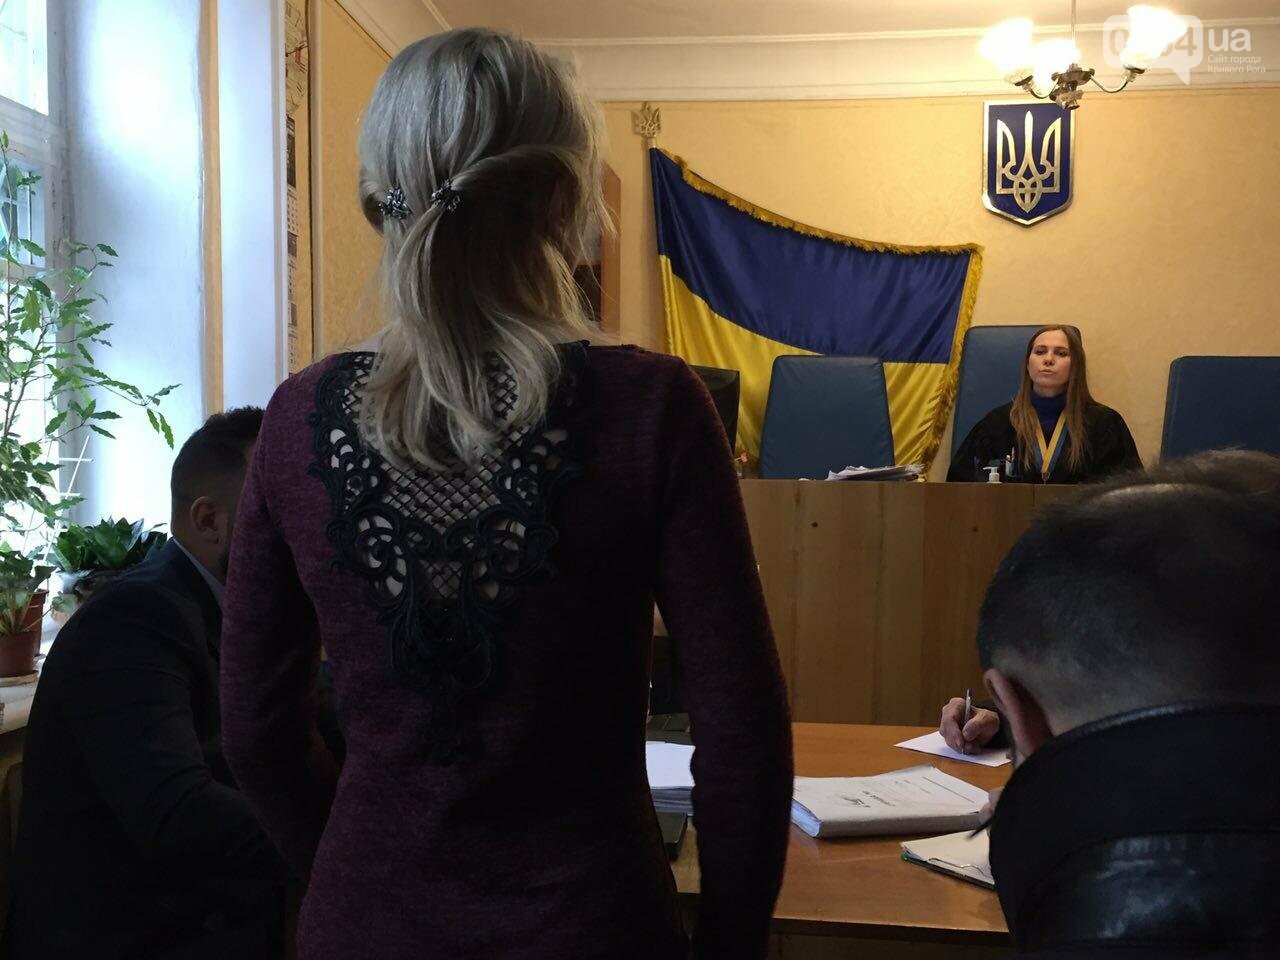 Криворожских журналистов в суде  допрашивают по делу Вячеслава Волка (ФОТО), фото-2